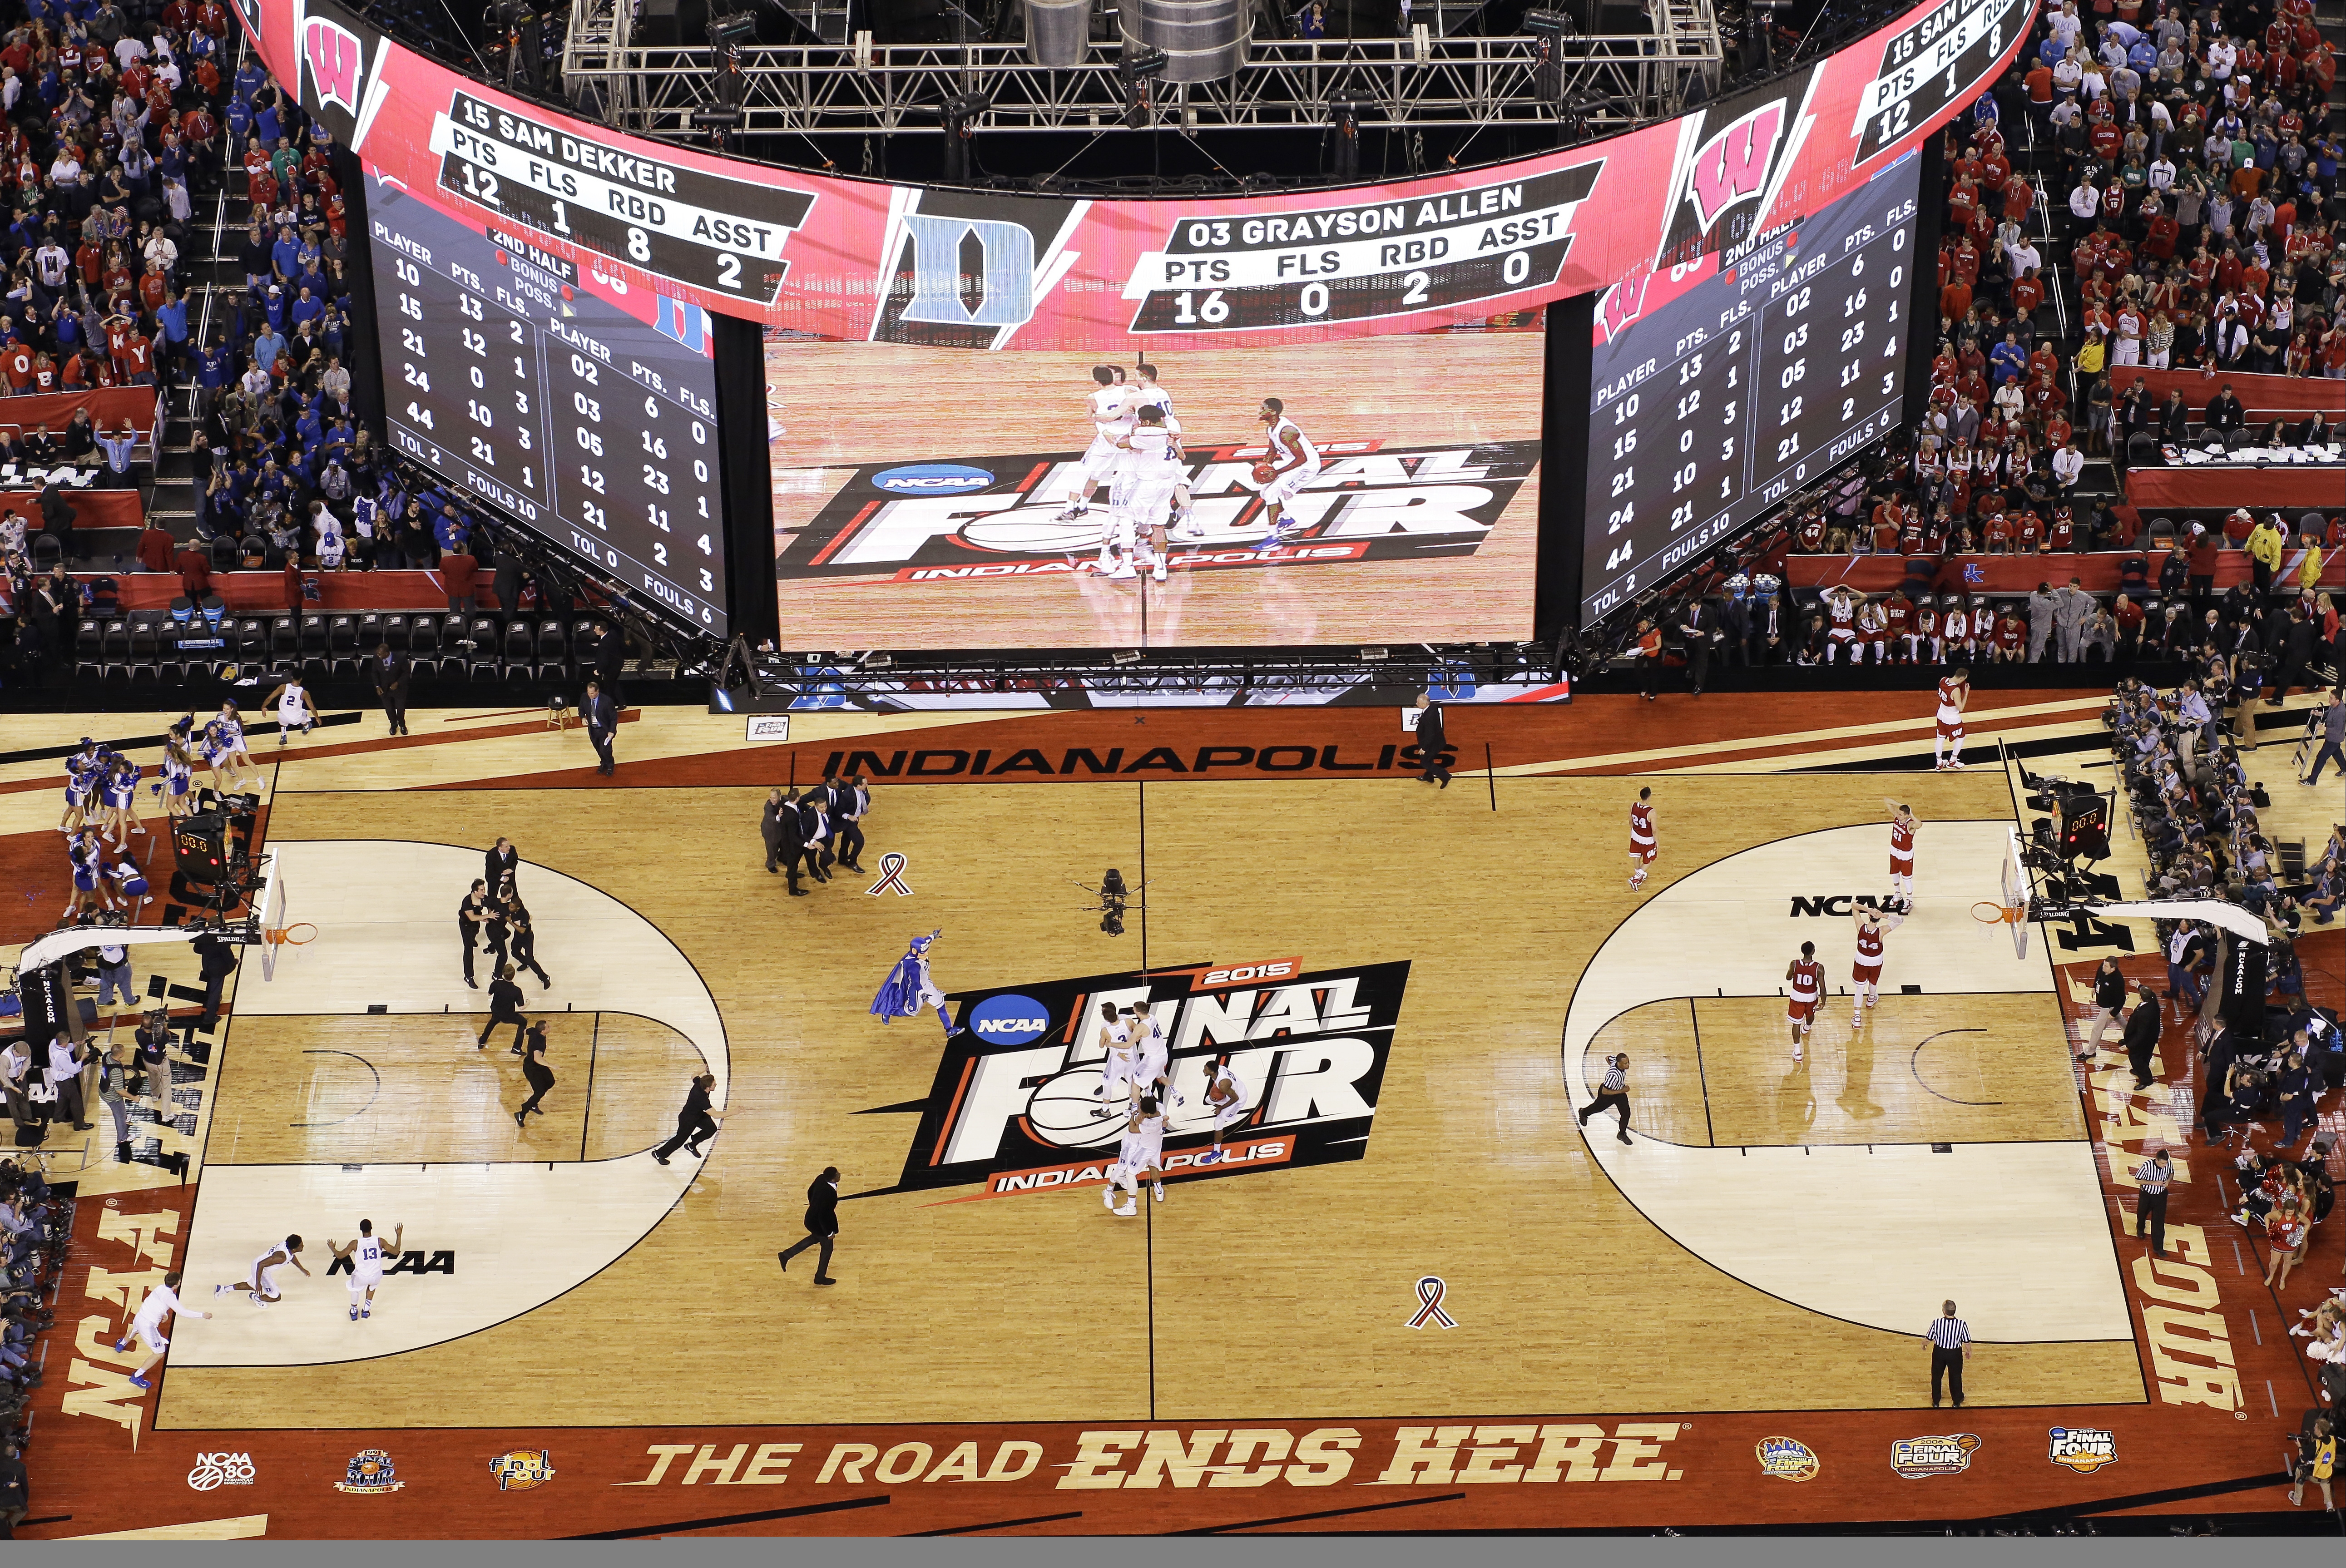 Cbs And Turner Set Broadcast Plans For Ncaa Men S Basketball Tournament Deadline